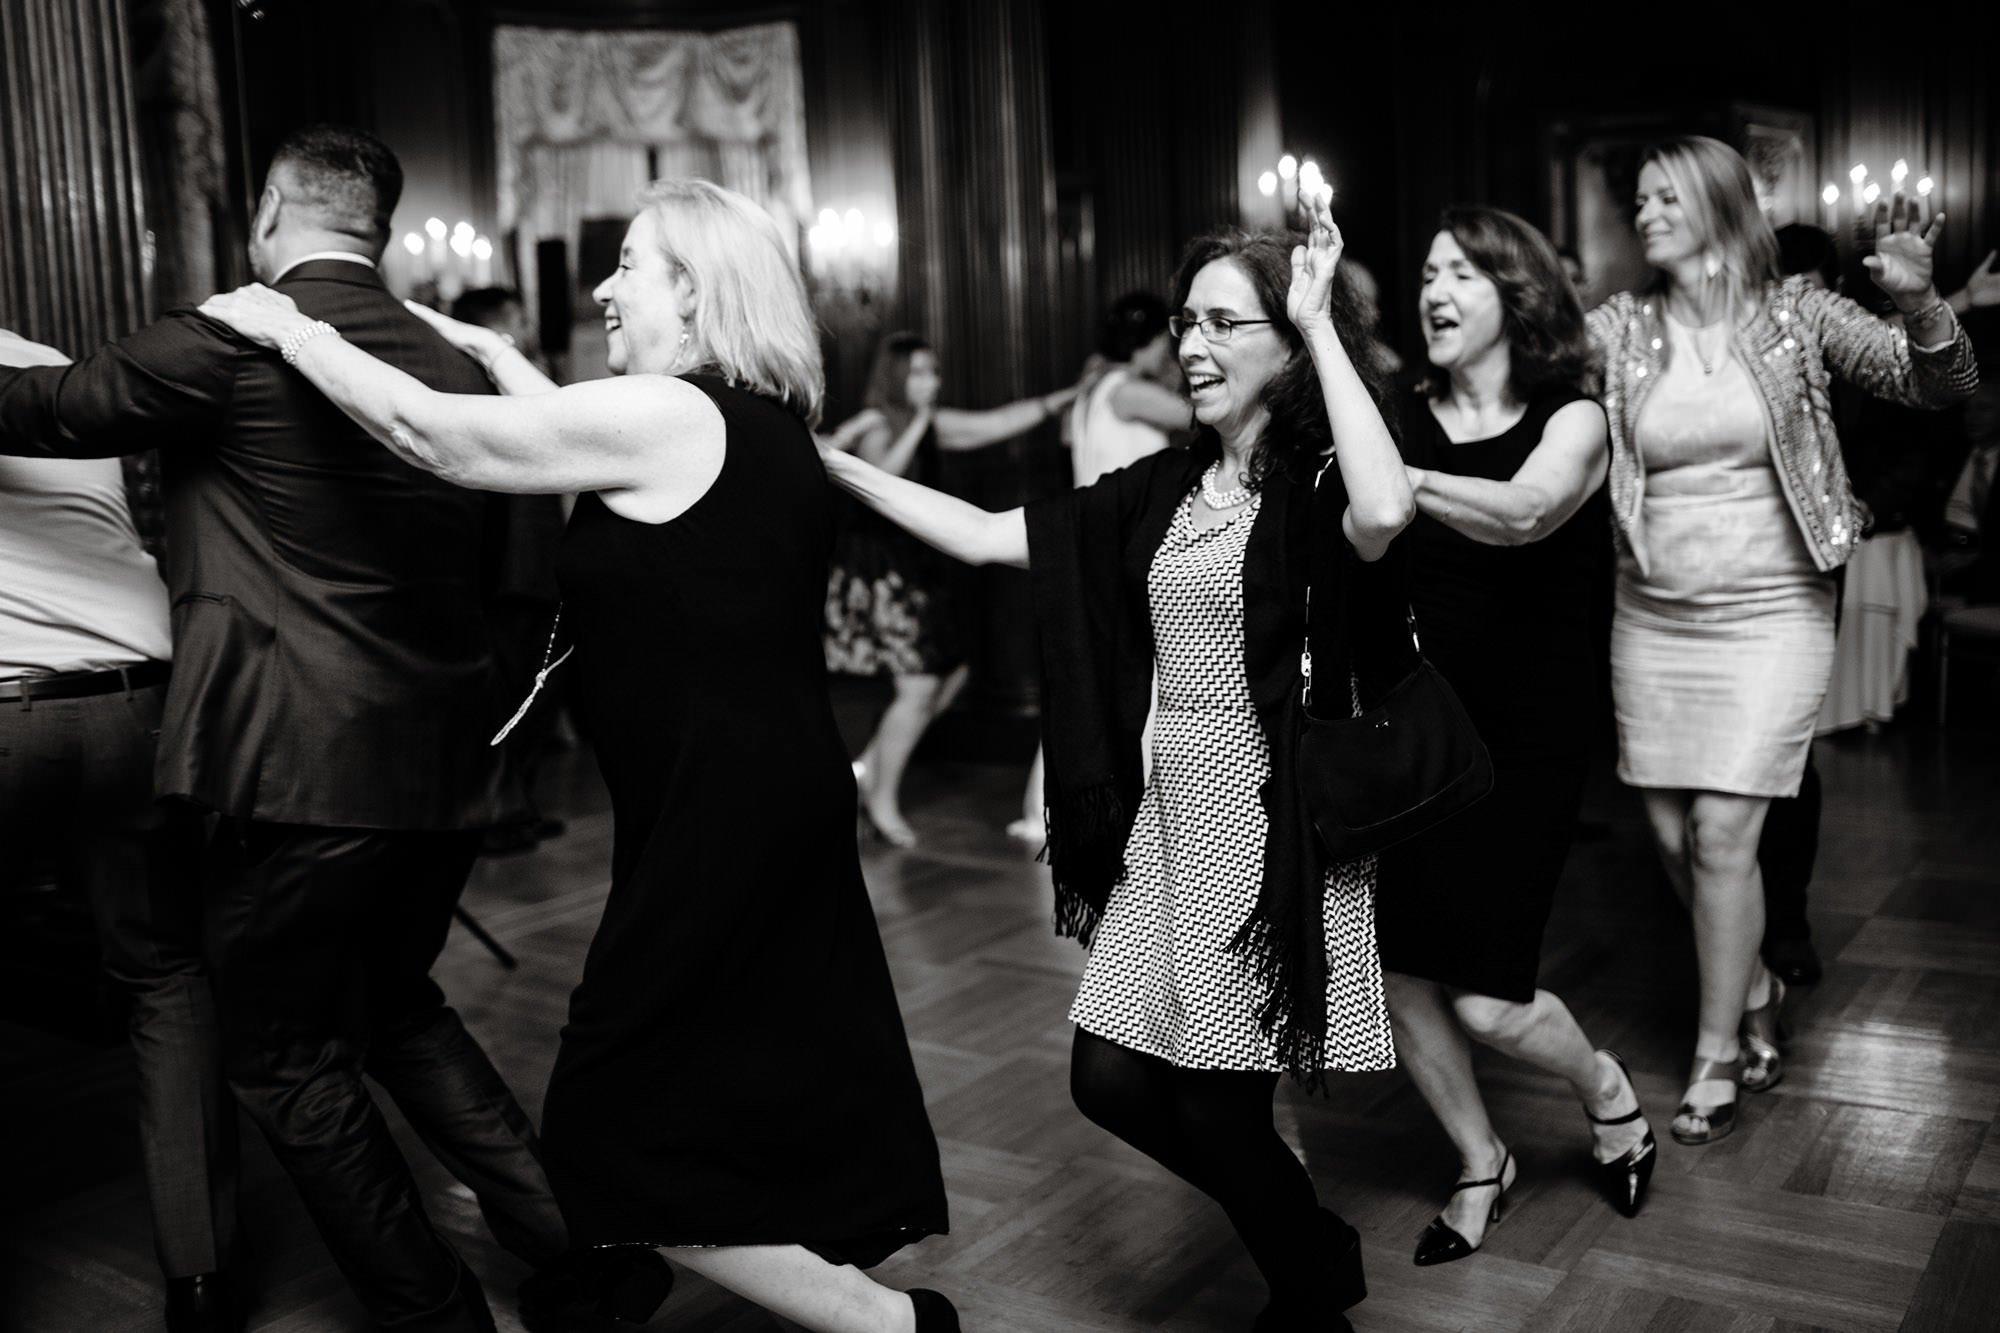 Guests enjoy the wedding reception at Cosmos Club in Washington, DC.